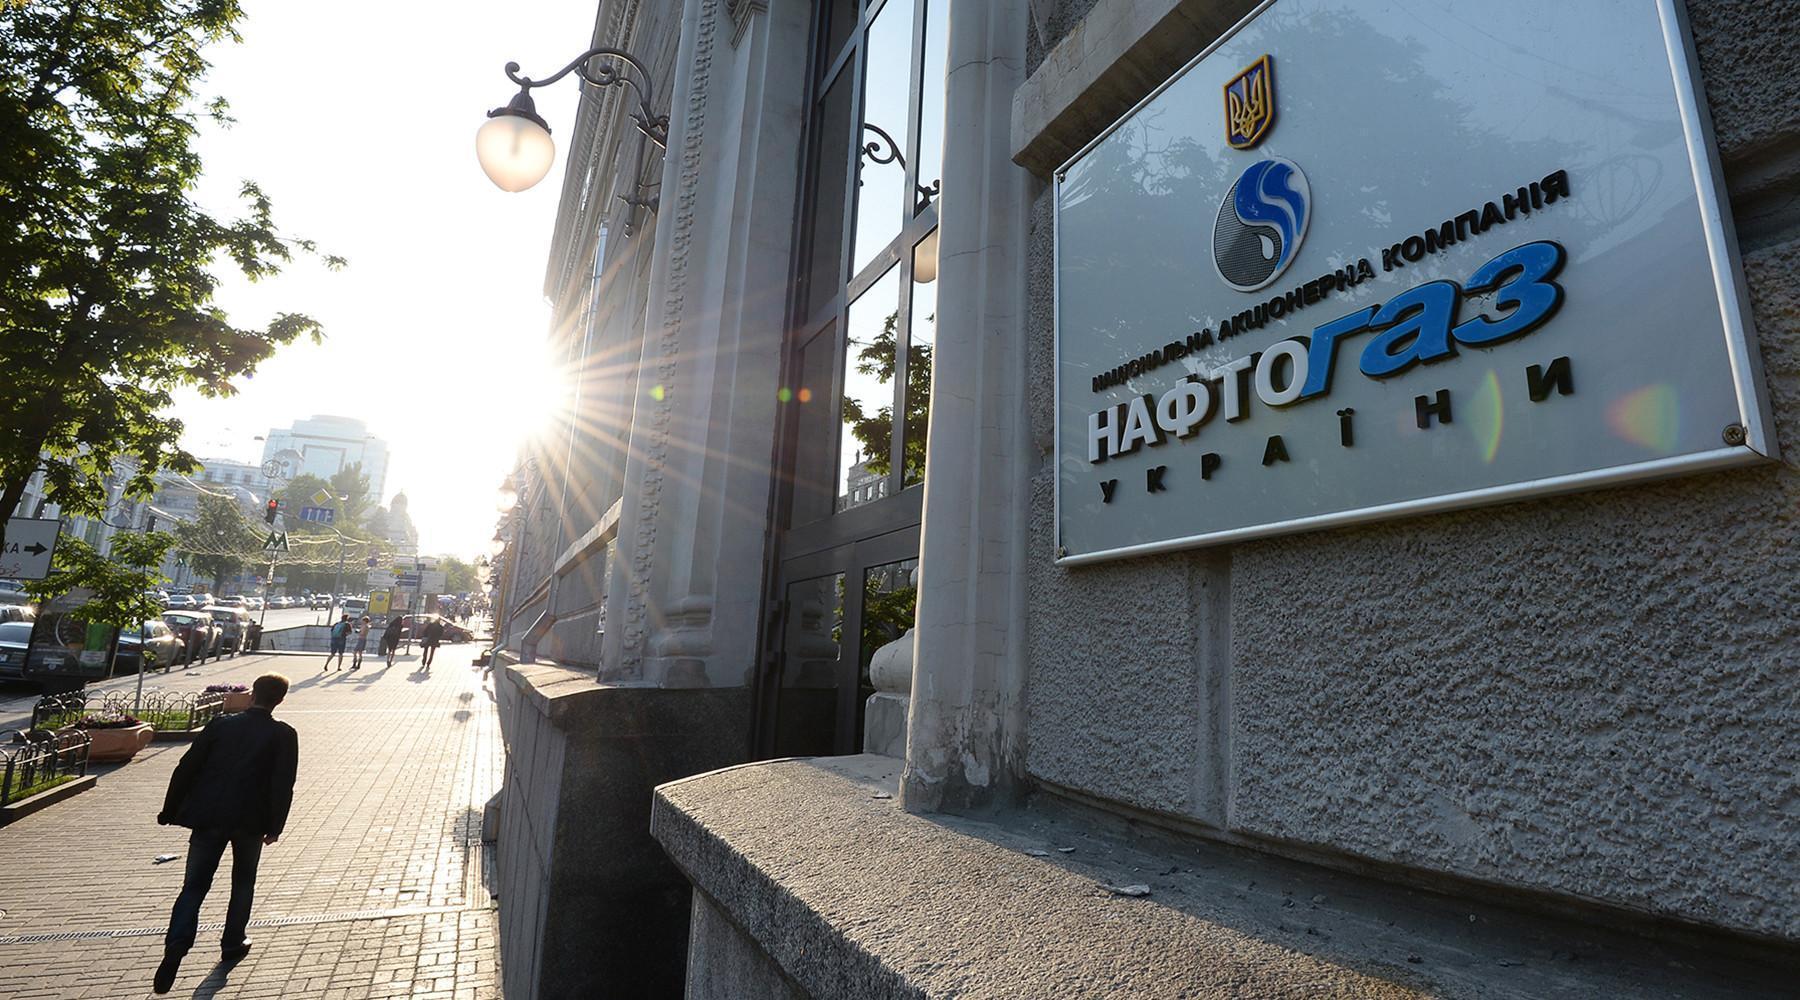 Naftogaz atacă frontal Gazprom